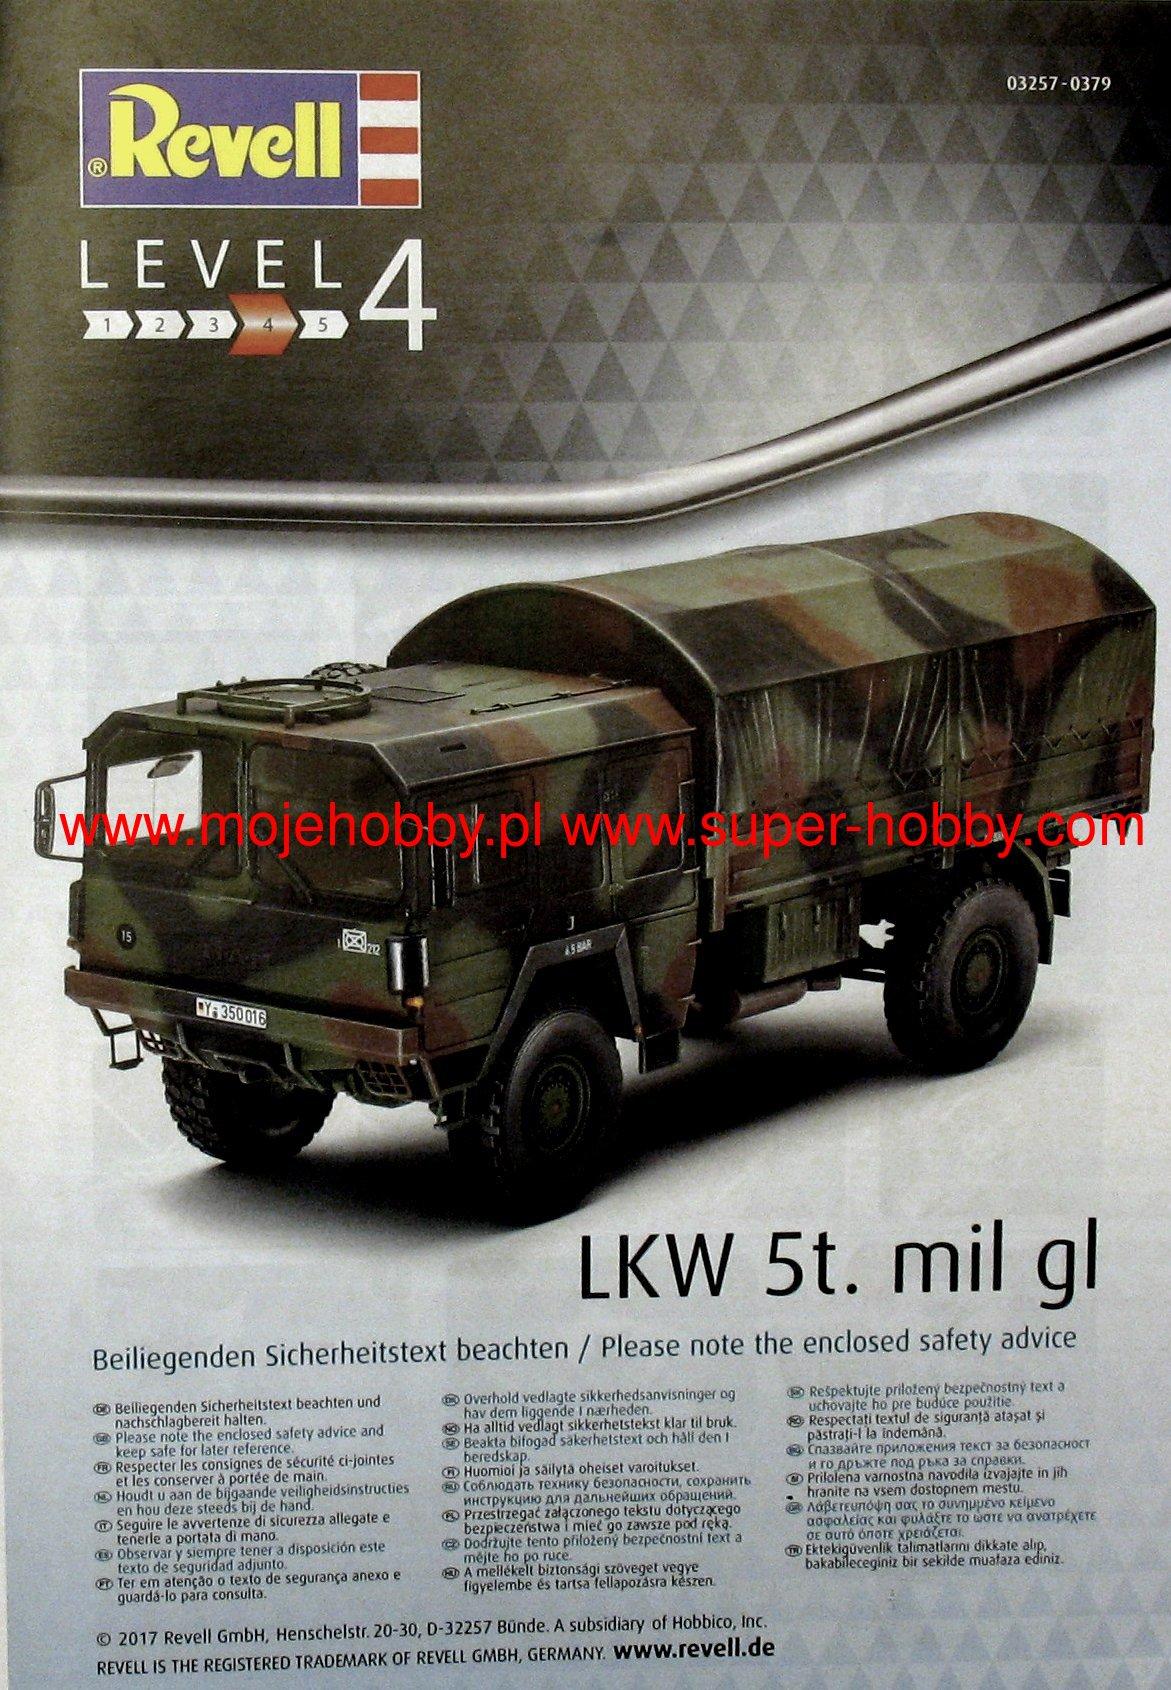 Mil Gl im Maßstab 1:35 Modellbausatz LKW 5T Revell 03257 4x4 Truck